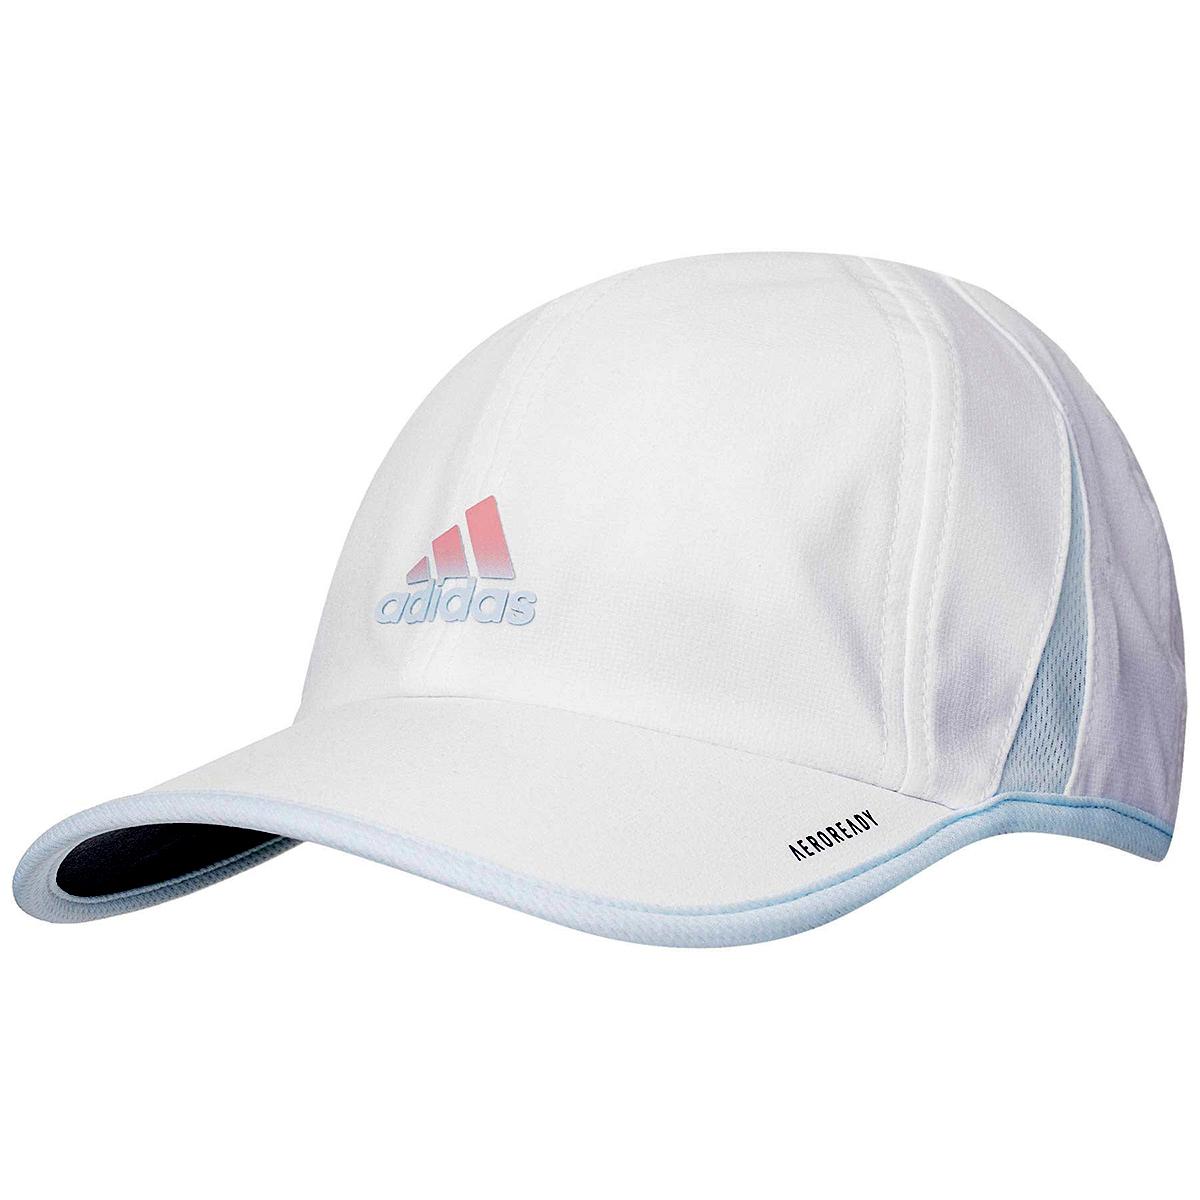 Women's Adidas Superlite Cap - Color: White/Sky Tint Blue - Size: One Size, White/Sky Tint Blue, large, image 1